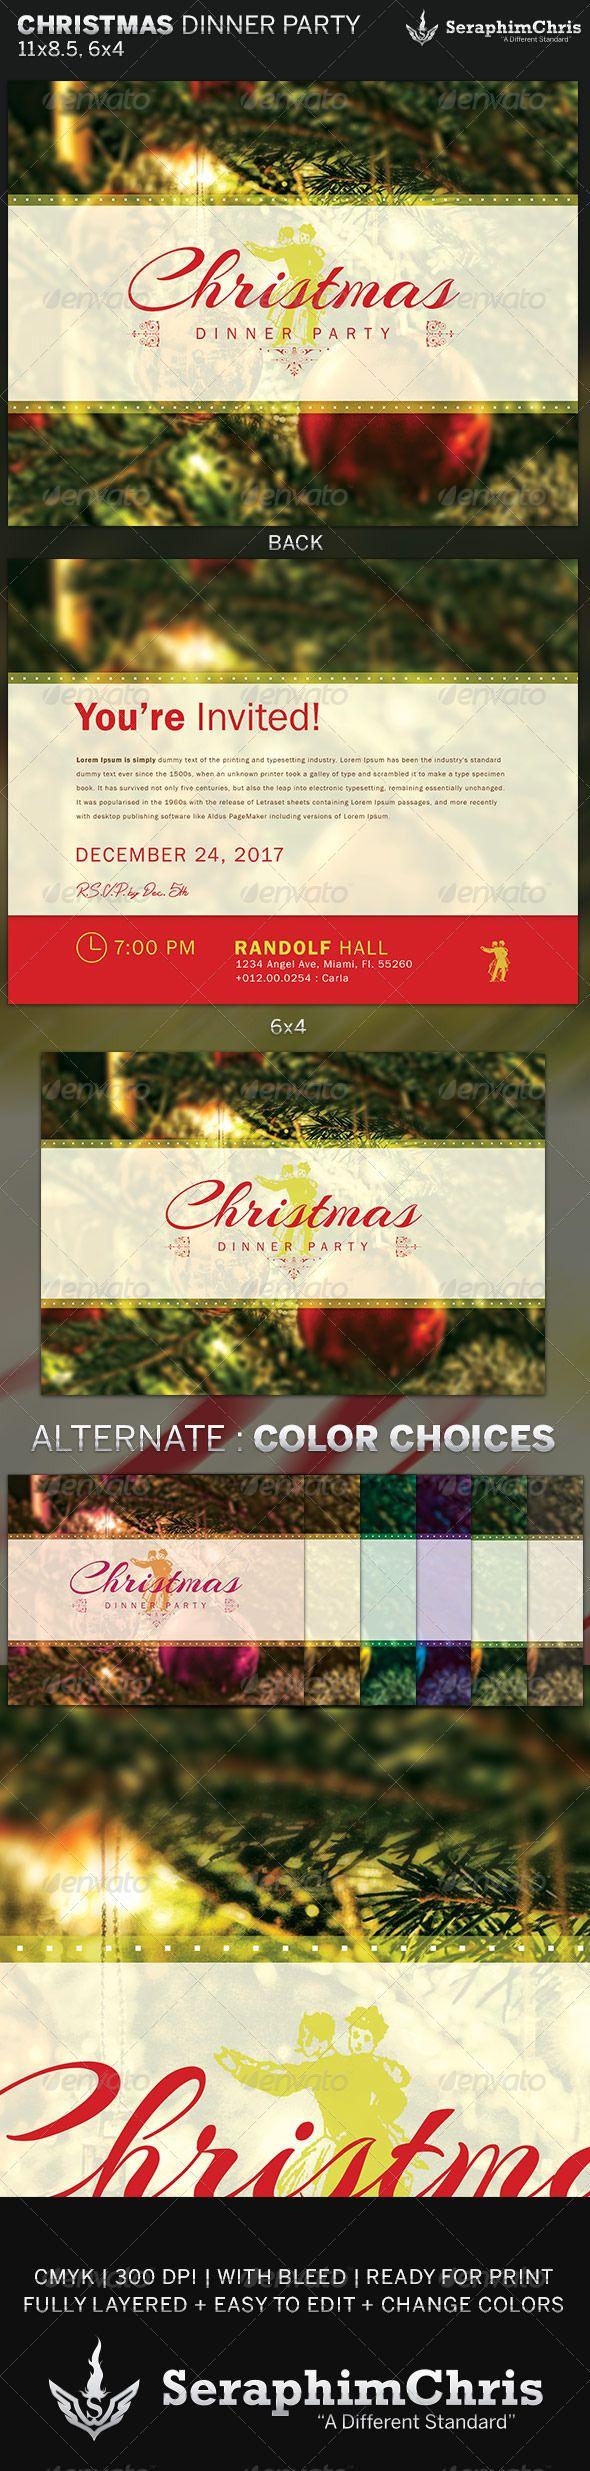 company christmas party invitation templates%0A Christmas Dinner Party Flyer Invite Template